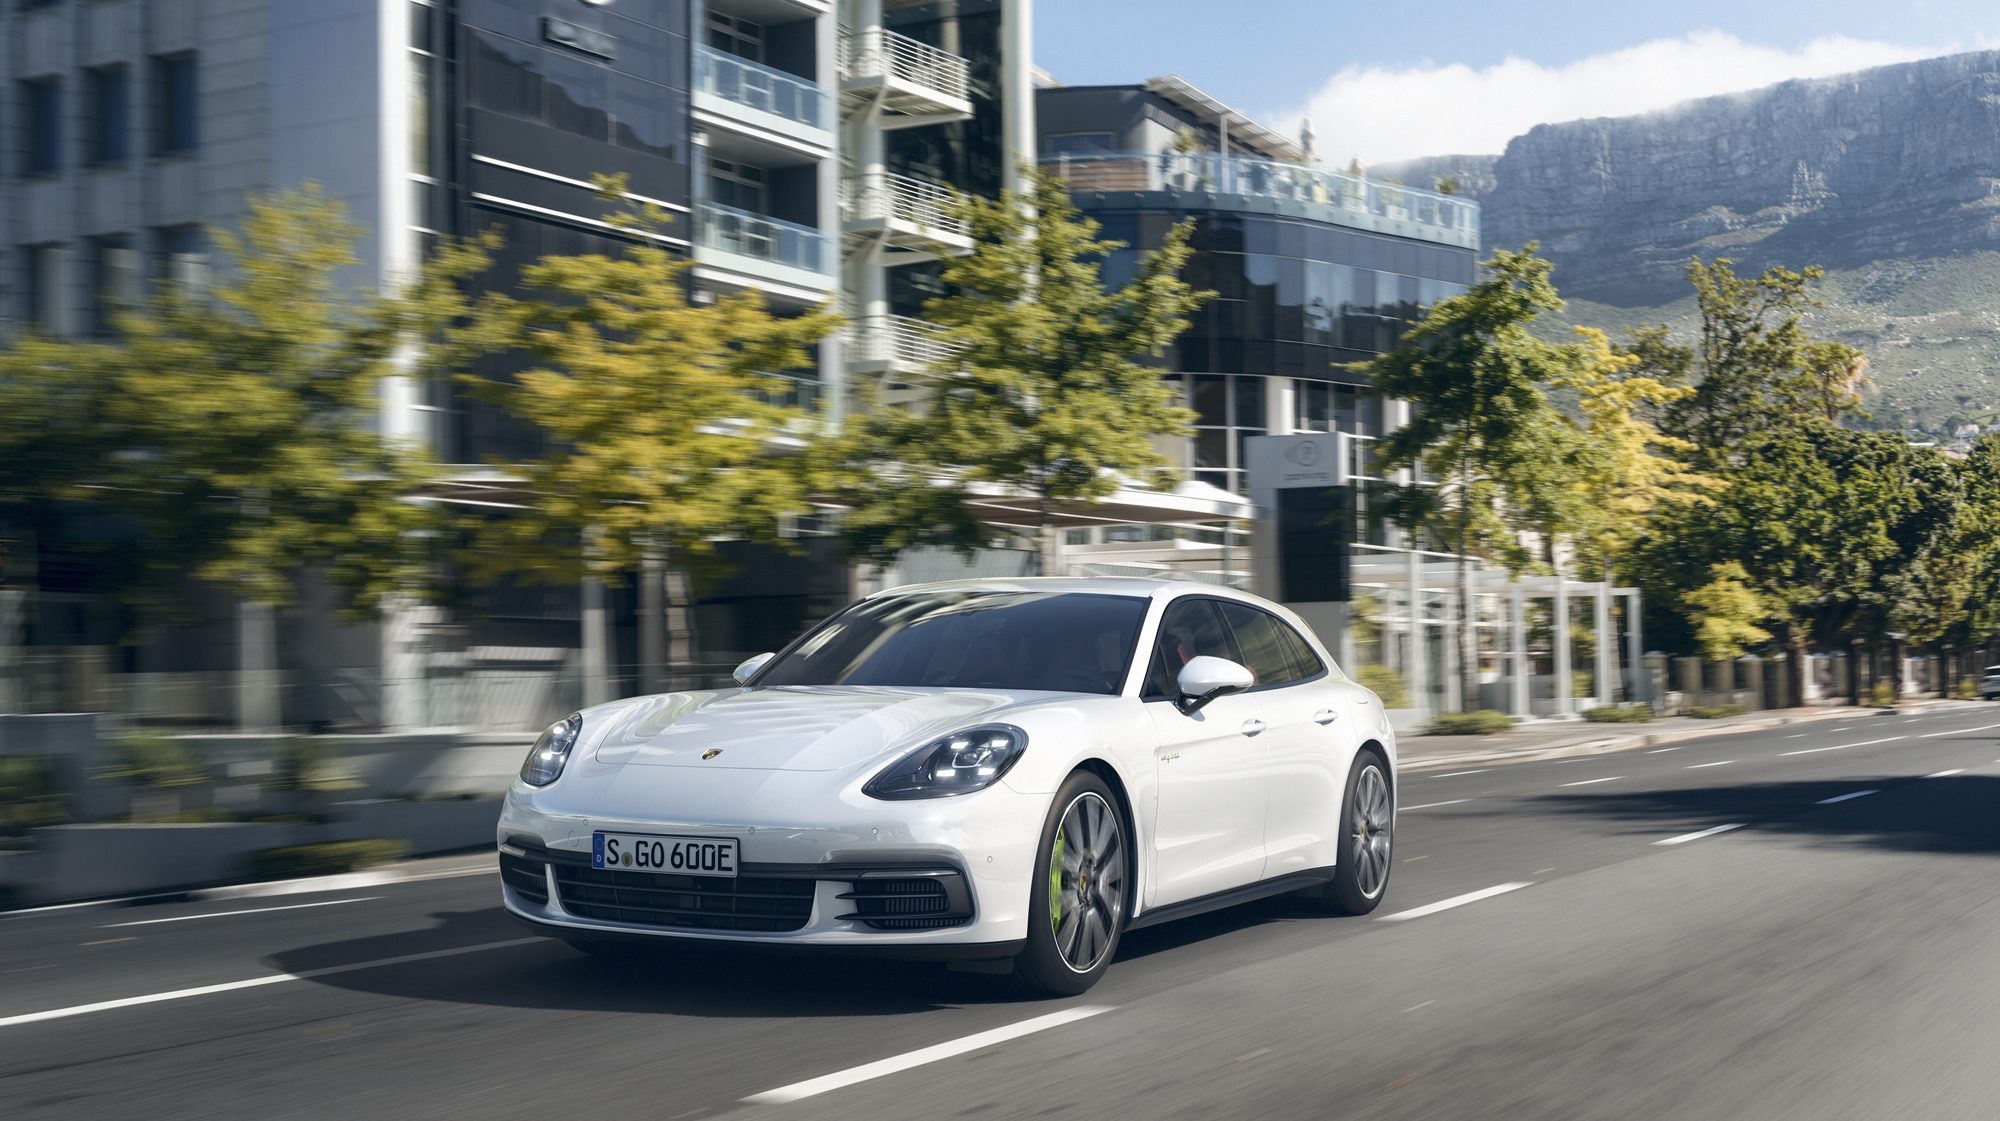 Porsche Panamera Sport Turismo High Quality Wallpapers